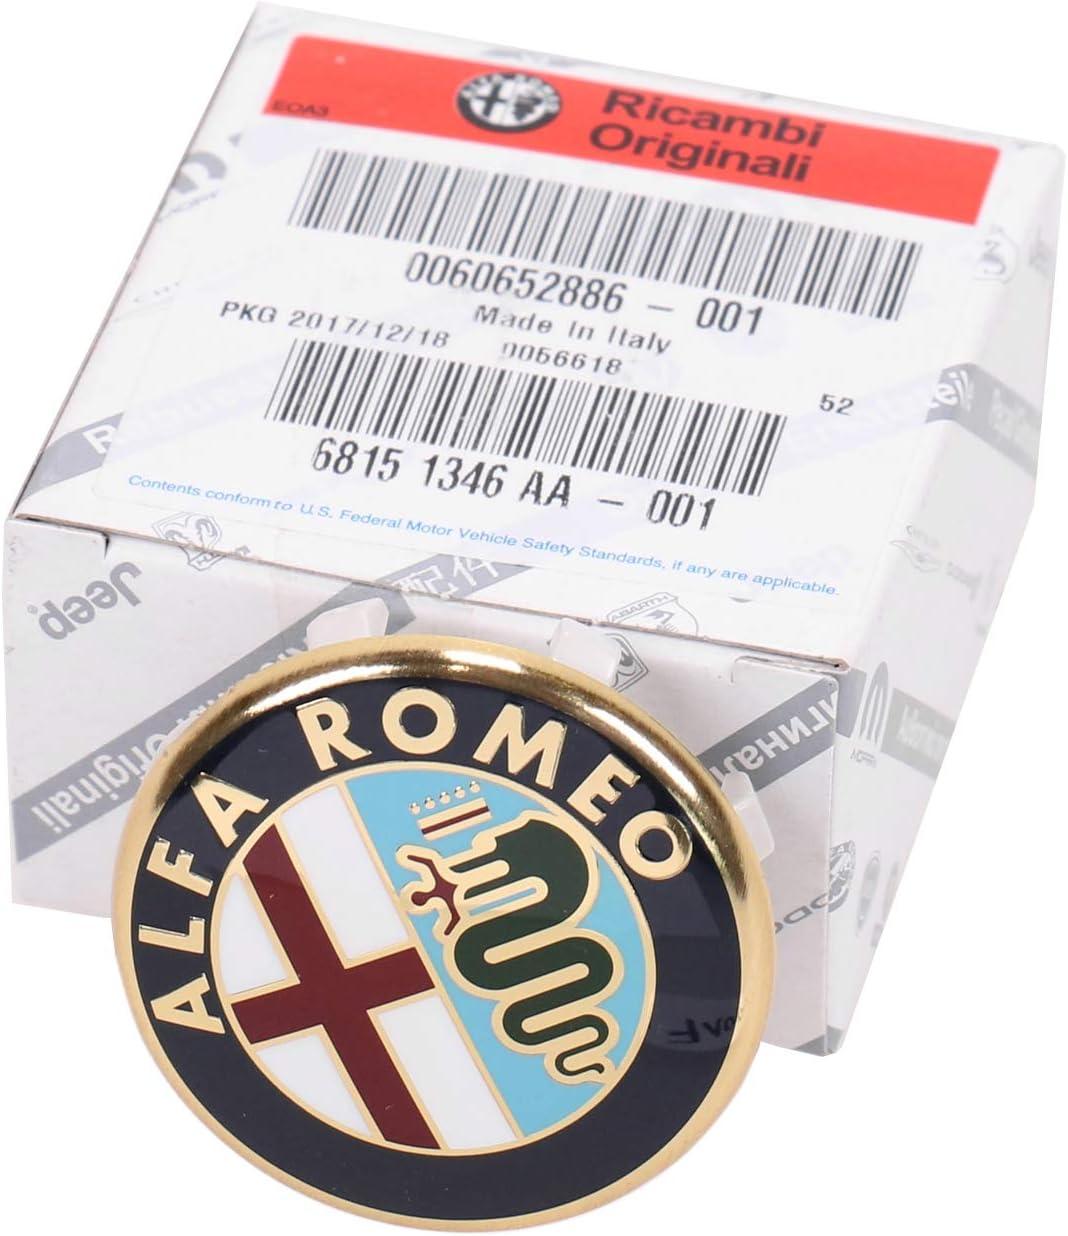 Original Alfa Romeo Nabendeckel Alufelge Felgendeckel Nabenkappe 60652886 Auto